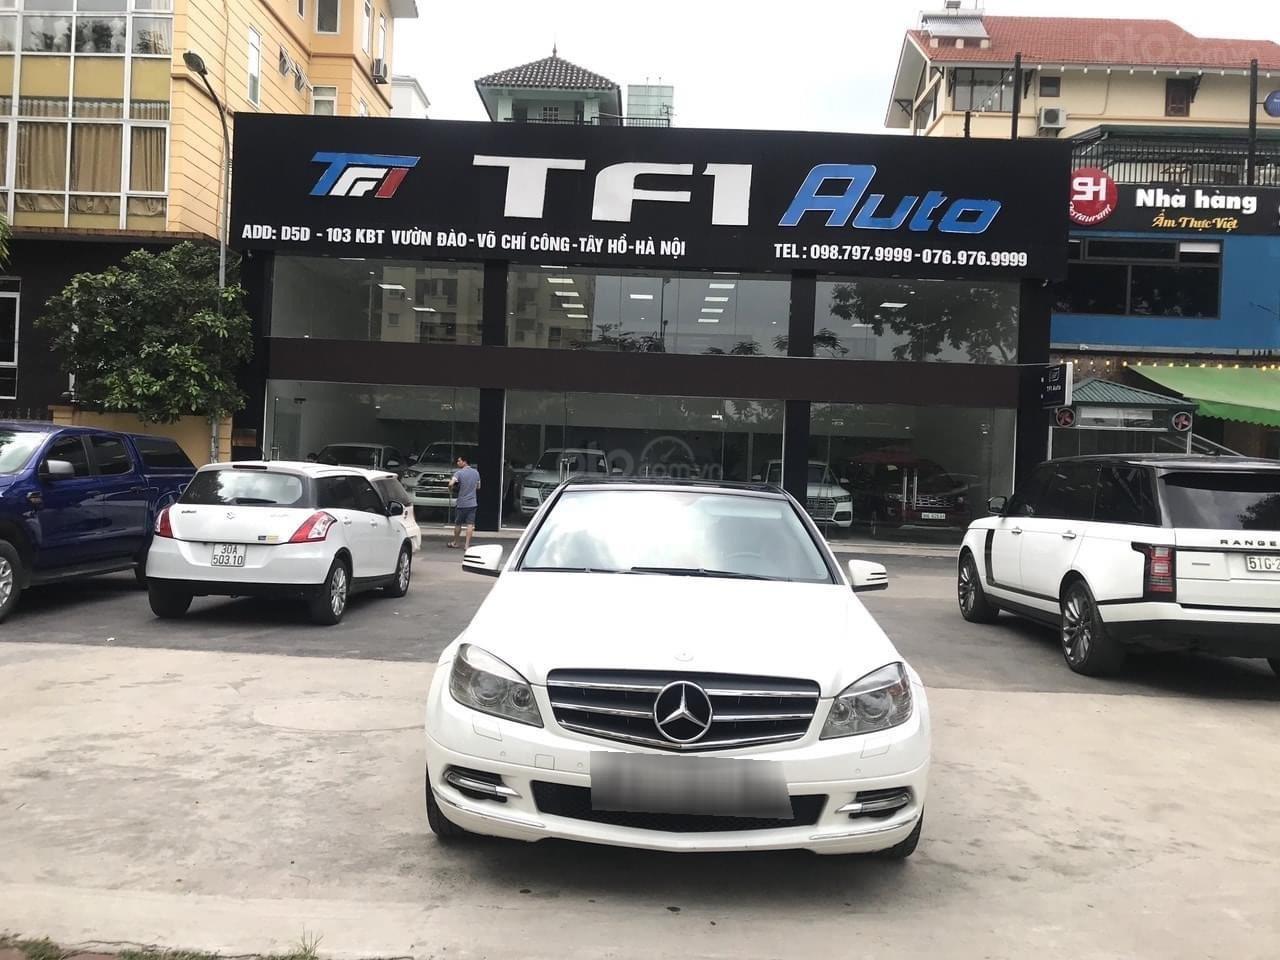 Cần bán lại xe Mercedes đời 2010 (1)